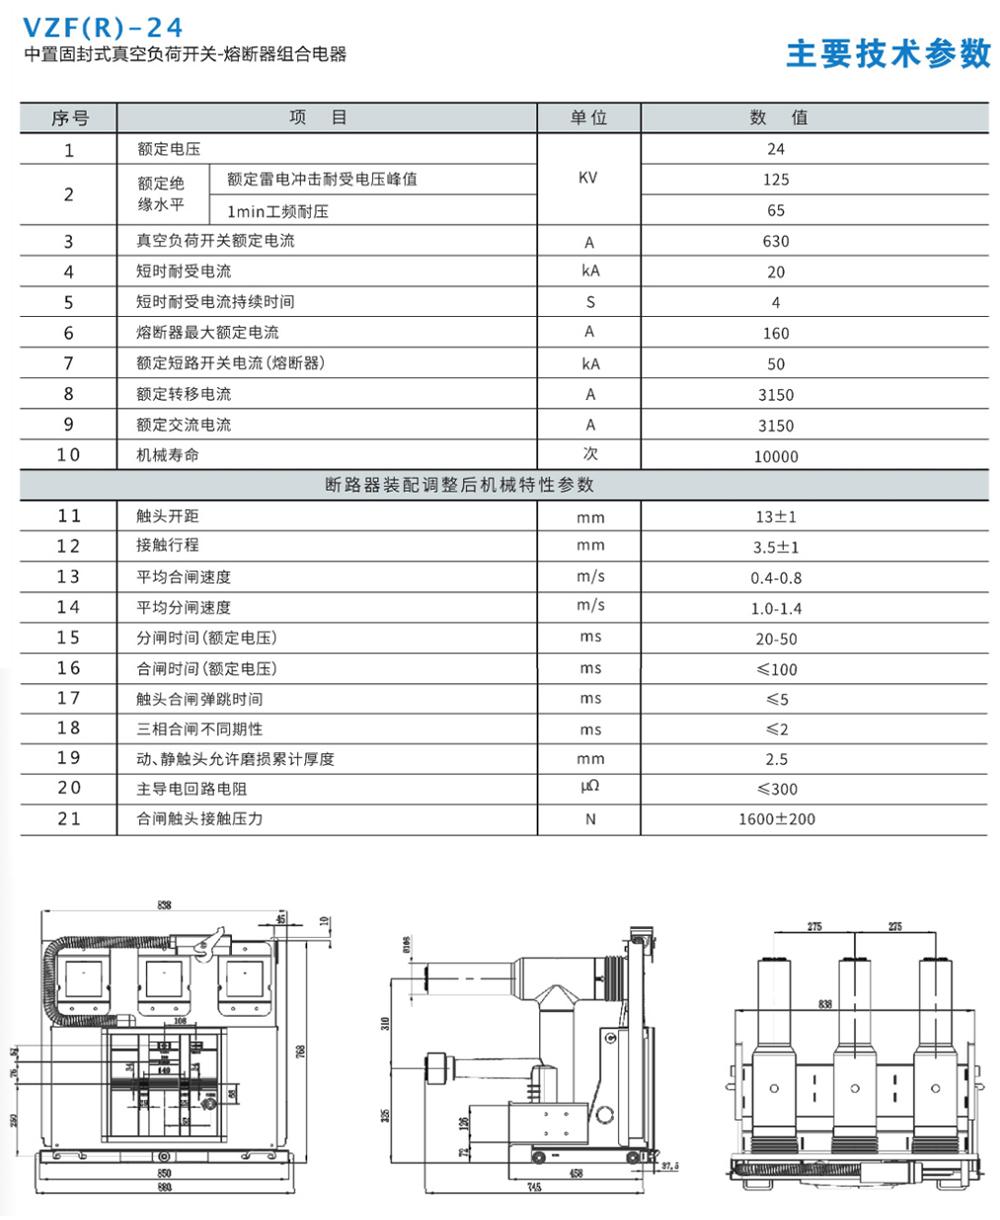 VZF(R)-24中置固封式真空負荷開關-熔斷器組合電器詳情.jpg